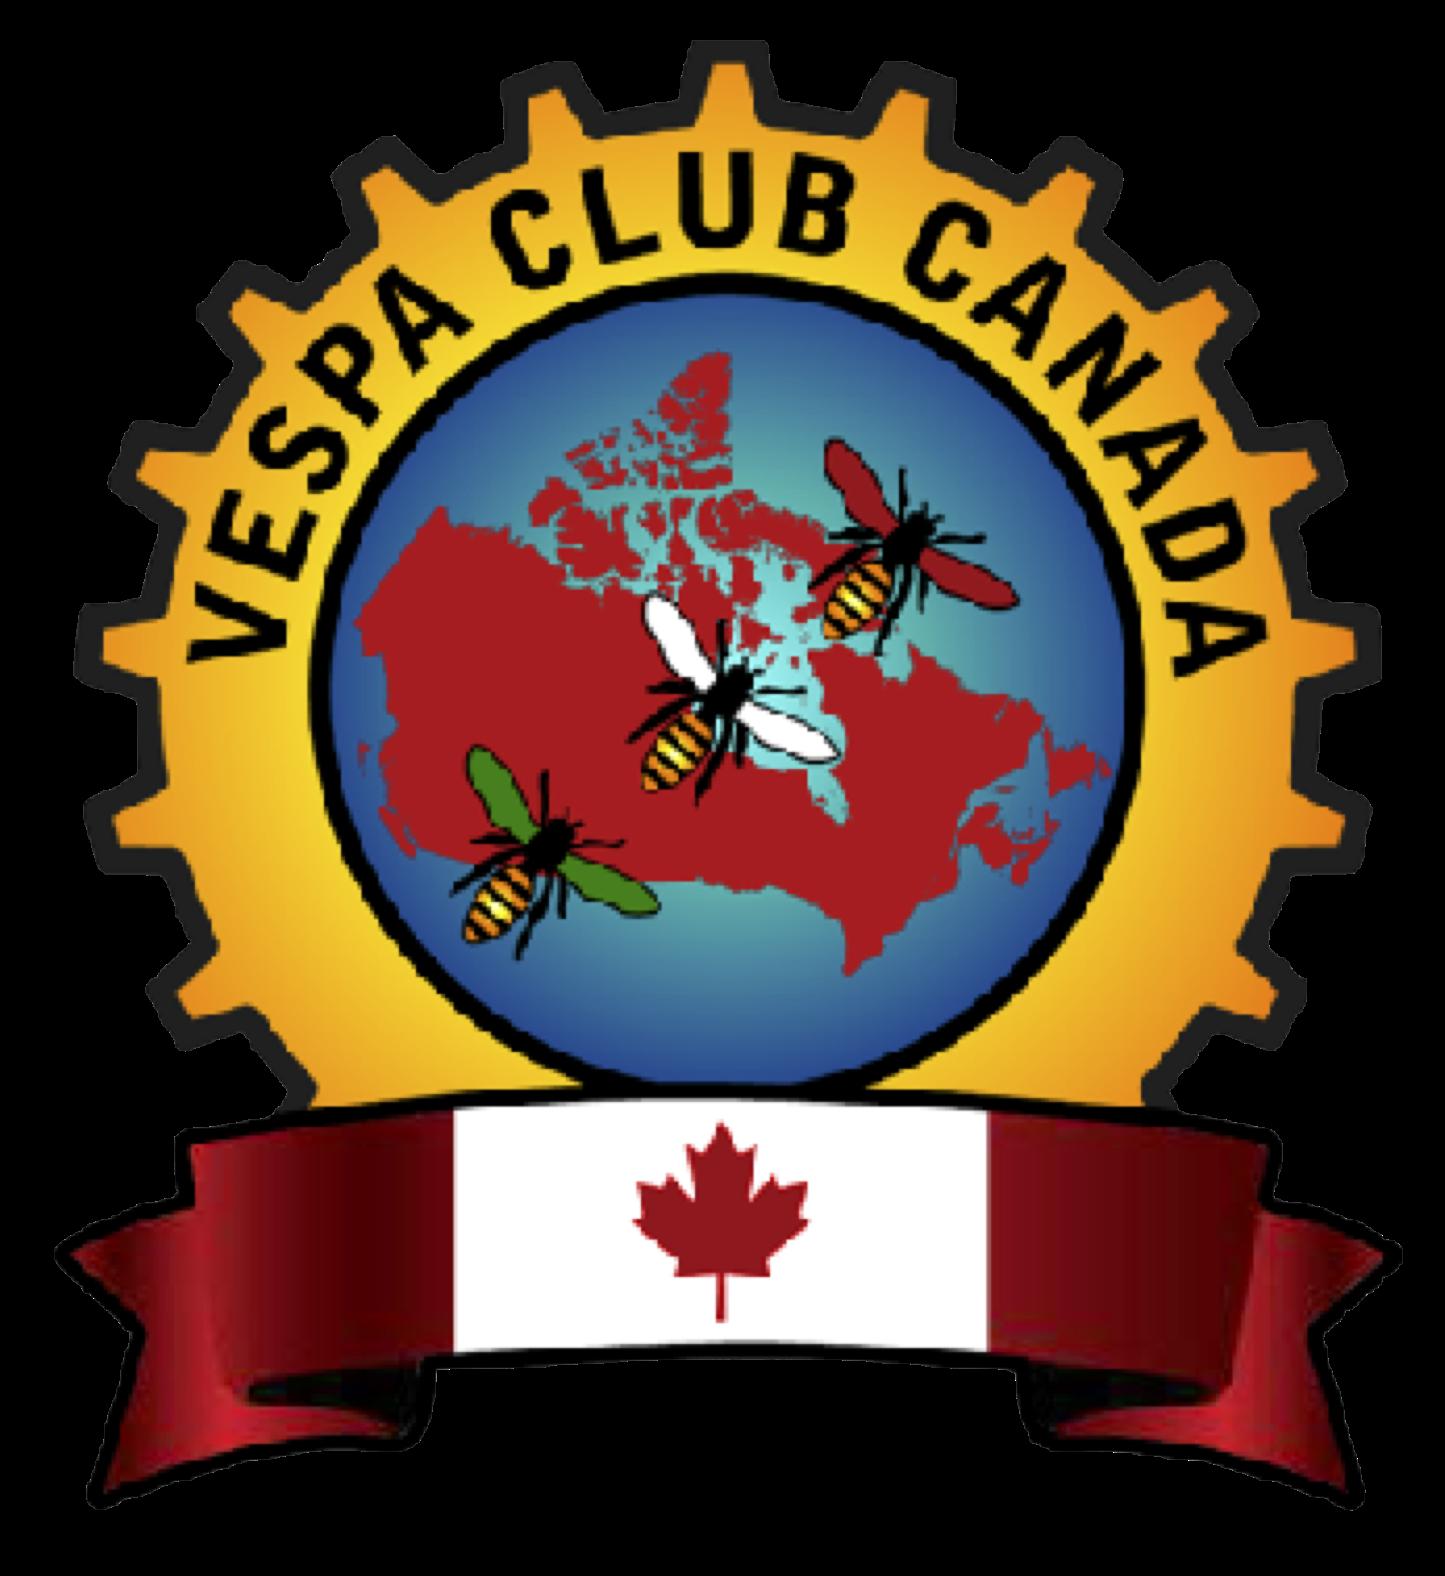 Vespa-Club-of-Canada-Coffee-espresso-blend-dark.png